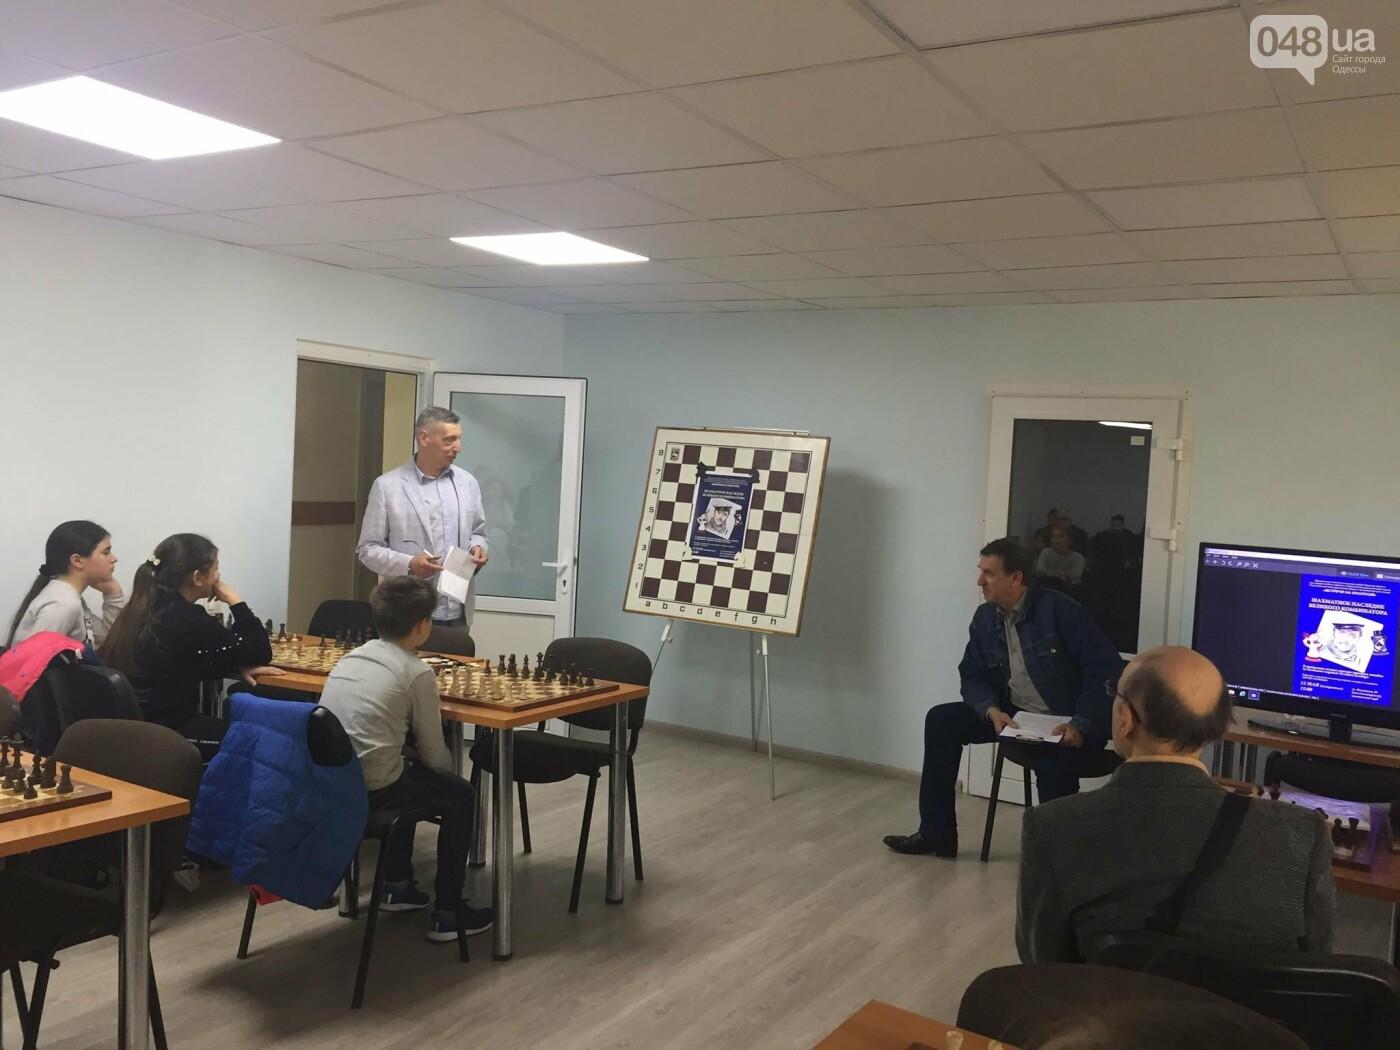 Одесситам рассказали о шахматном наследии Остапа Бендера,  - ФОТО, ВИДЕО, фото-2, Фото: 048